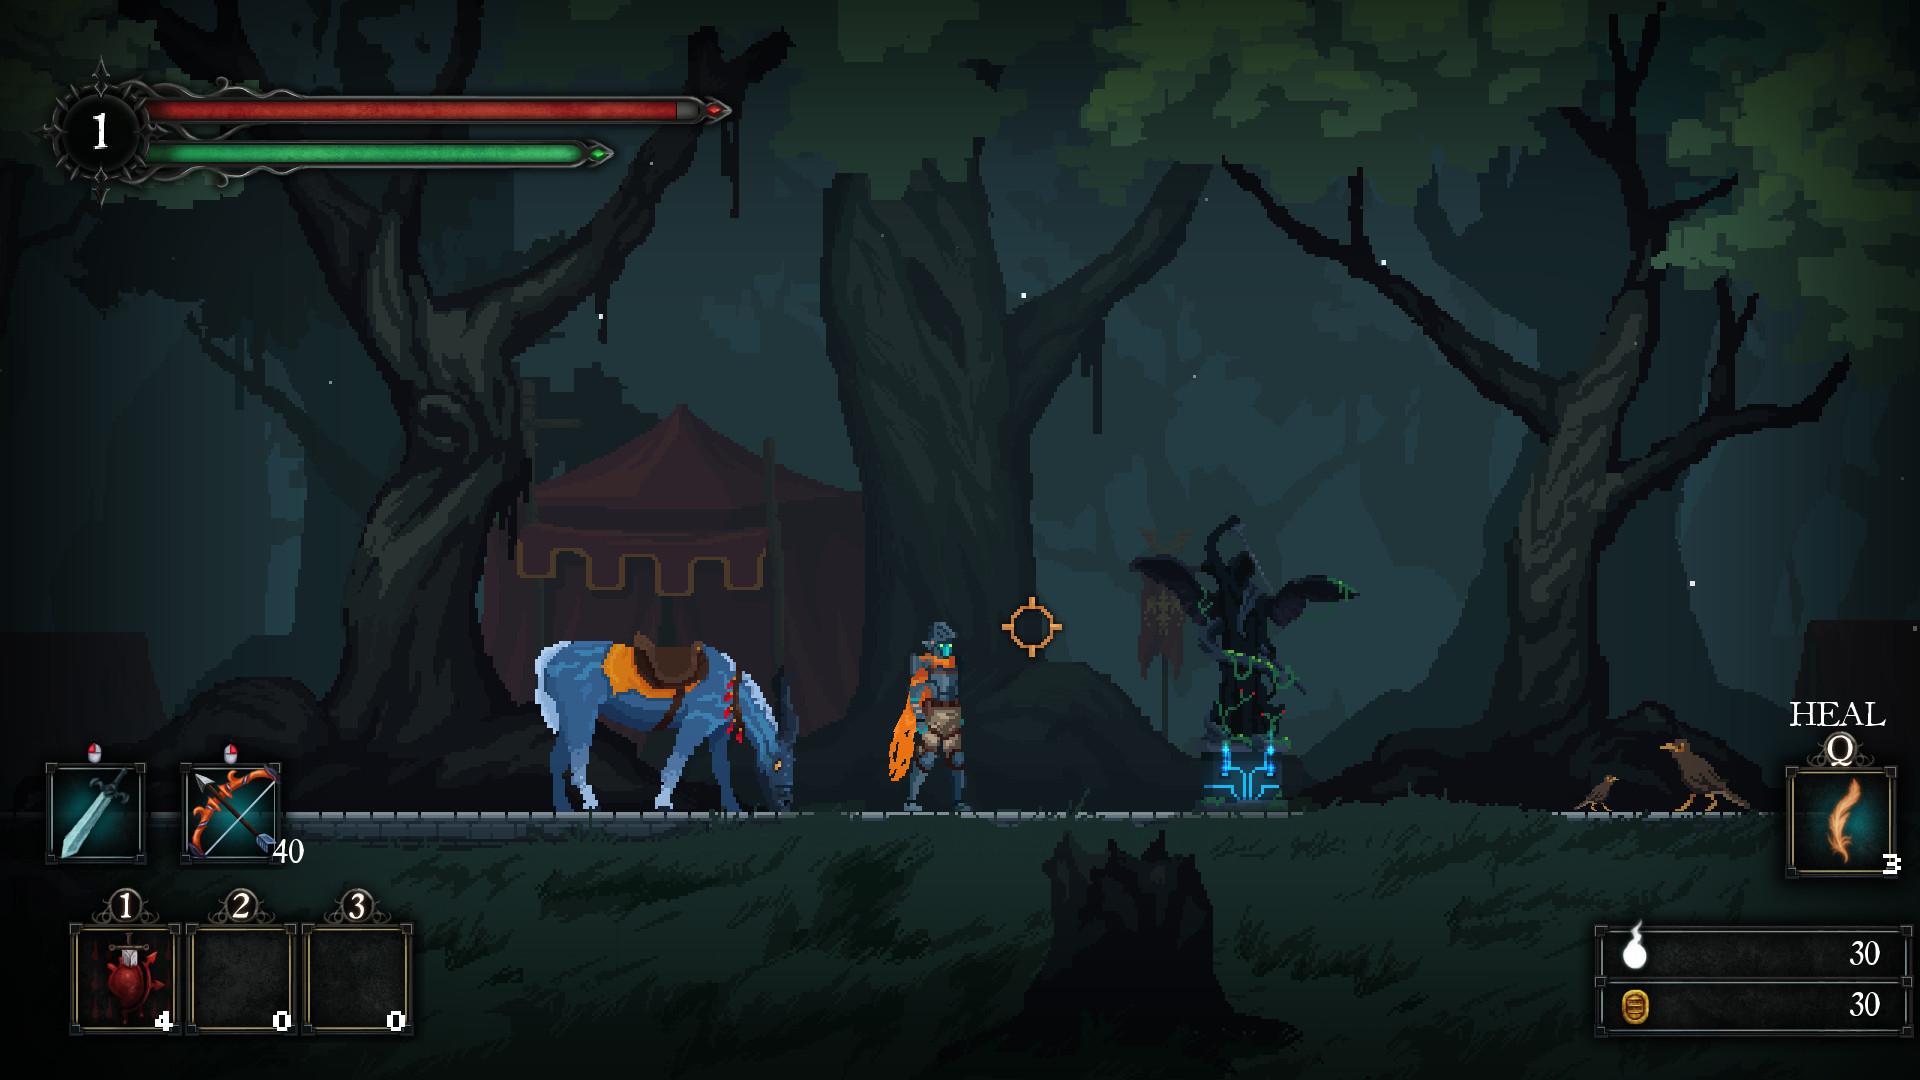 Mesclando RPG e 2D, Death's Gambit chegará para PS4 e PC em 2016 [vídeo]